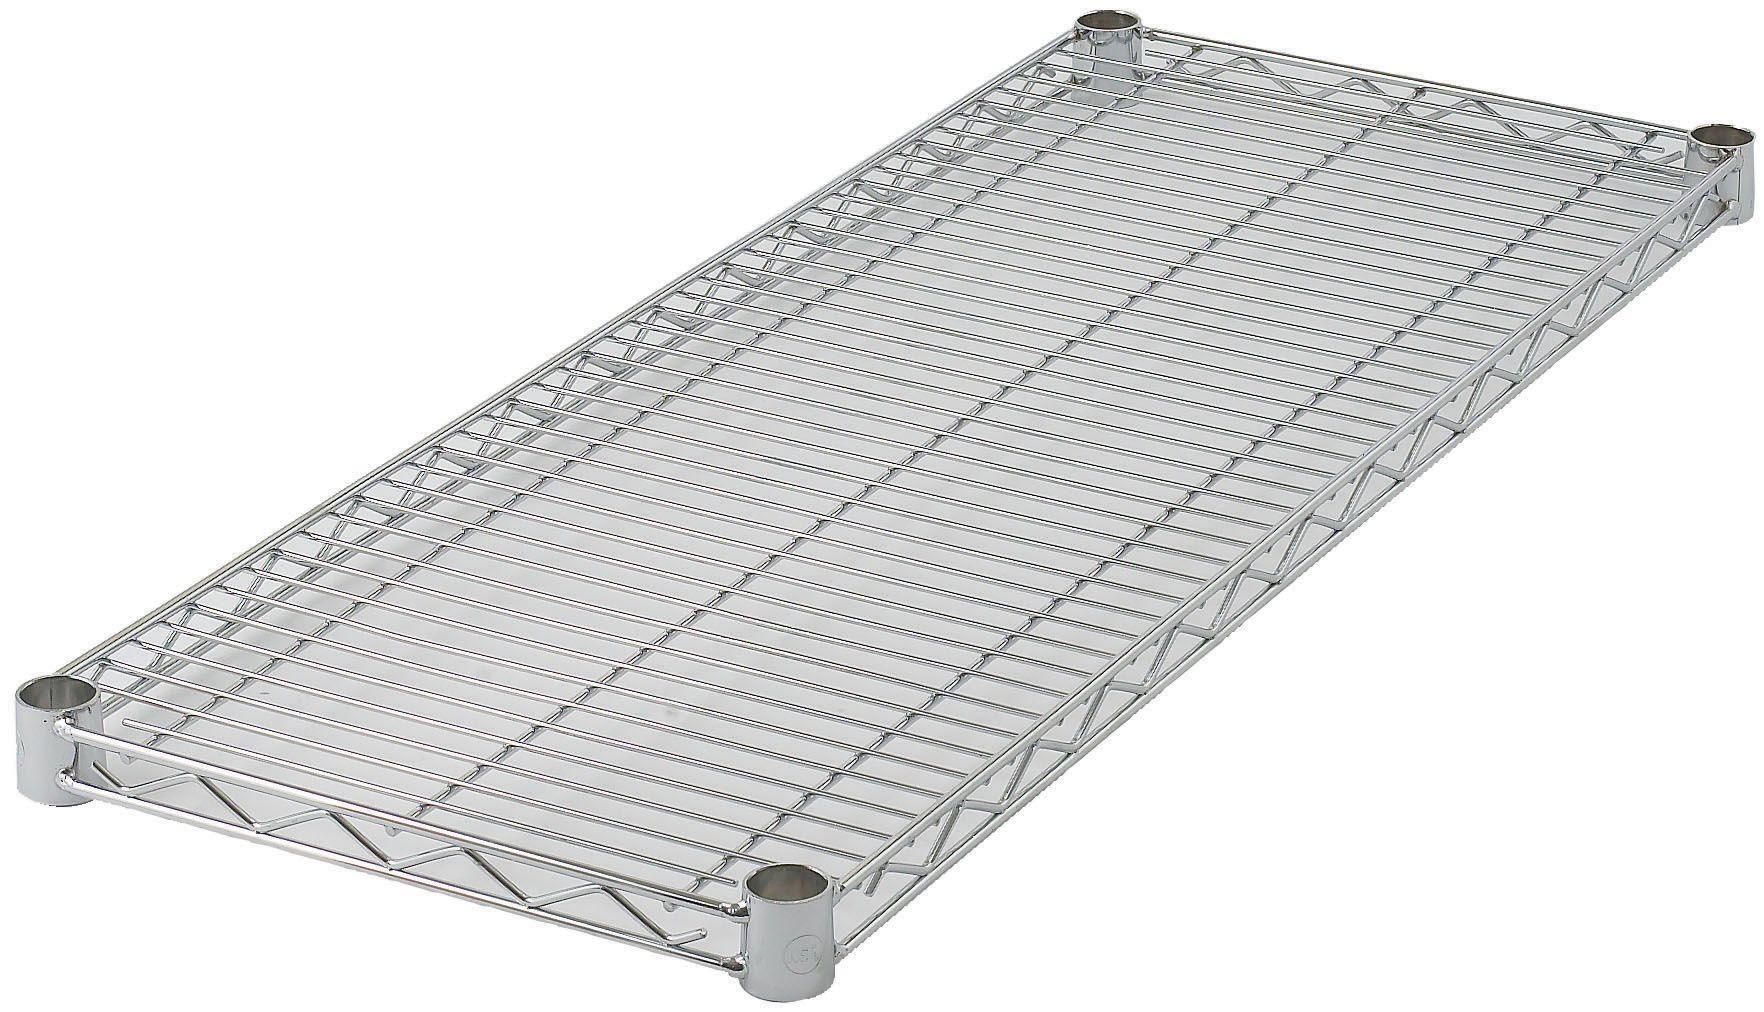 "Winco VC-1460 Chrome-Plated Wire Shelf 14"" x 60"""